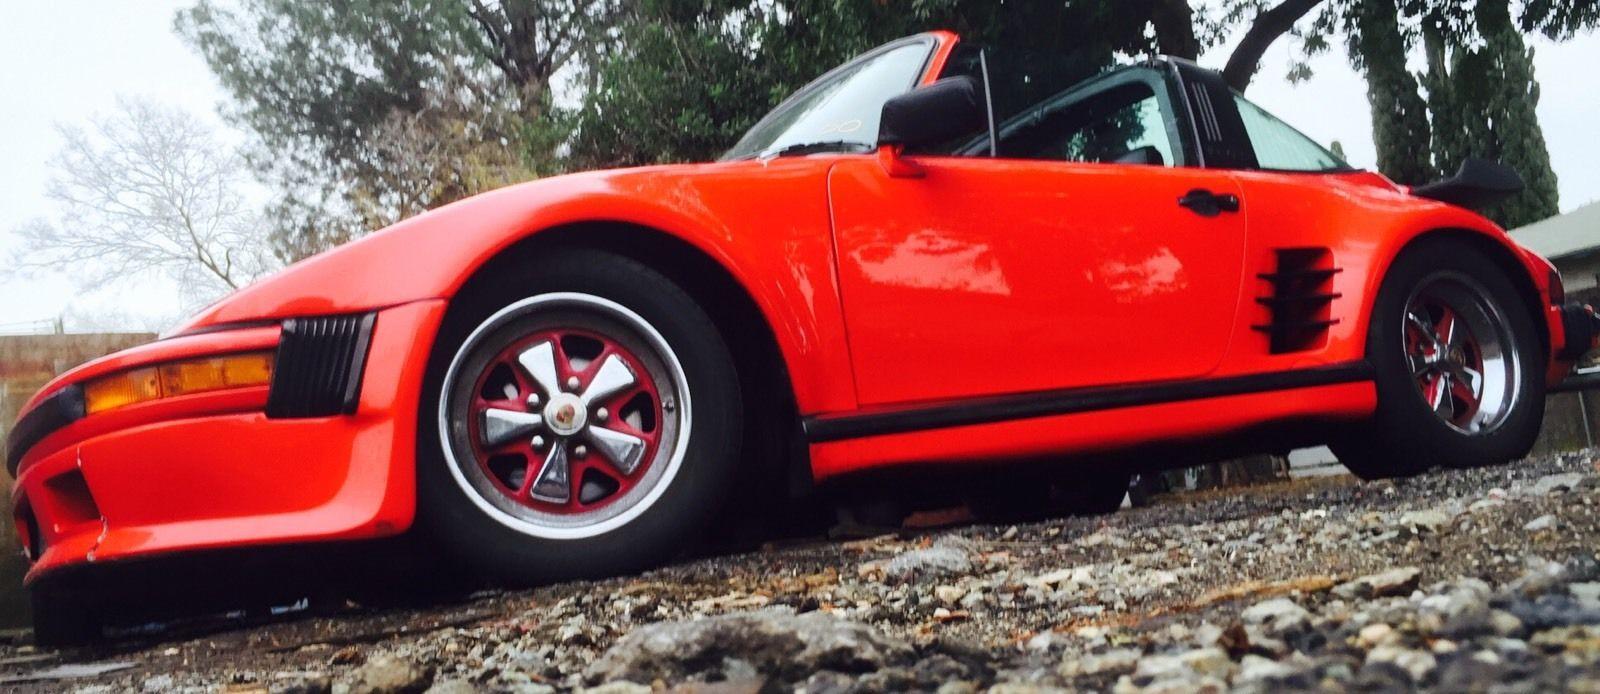 1987 Porsche 911 Carrera Targa Slant Nose For Sale